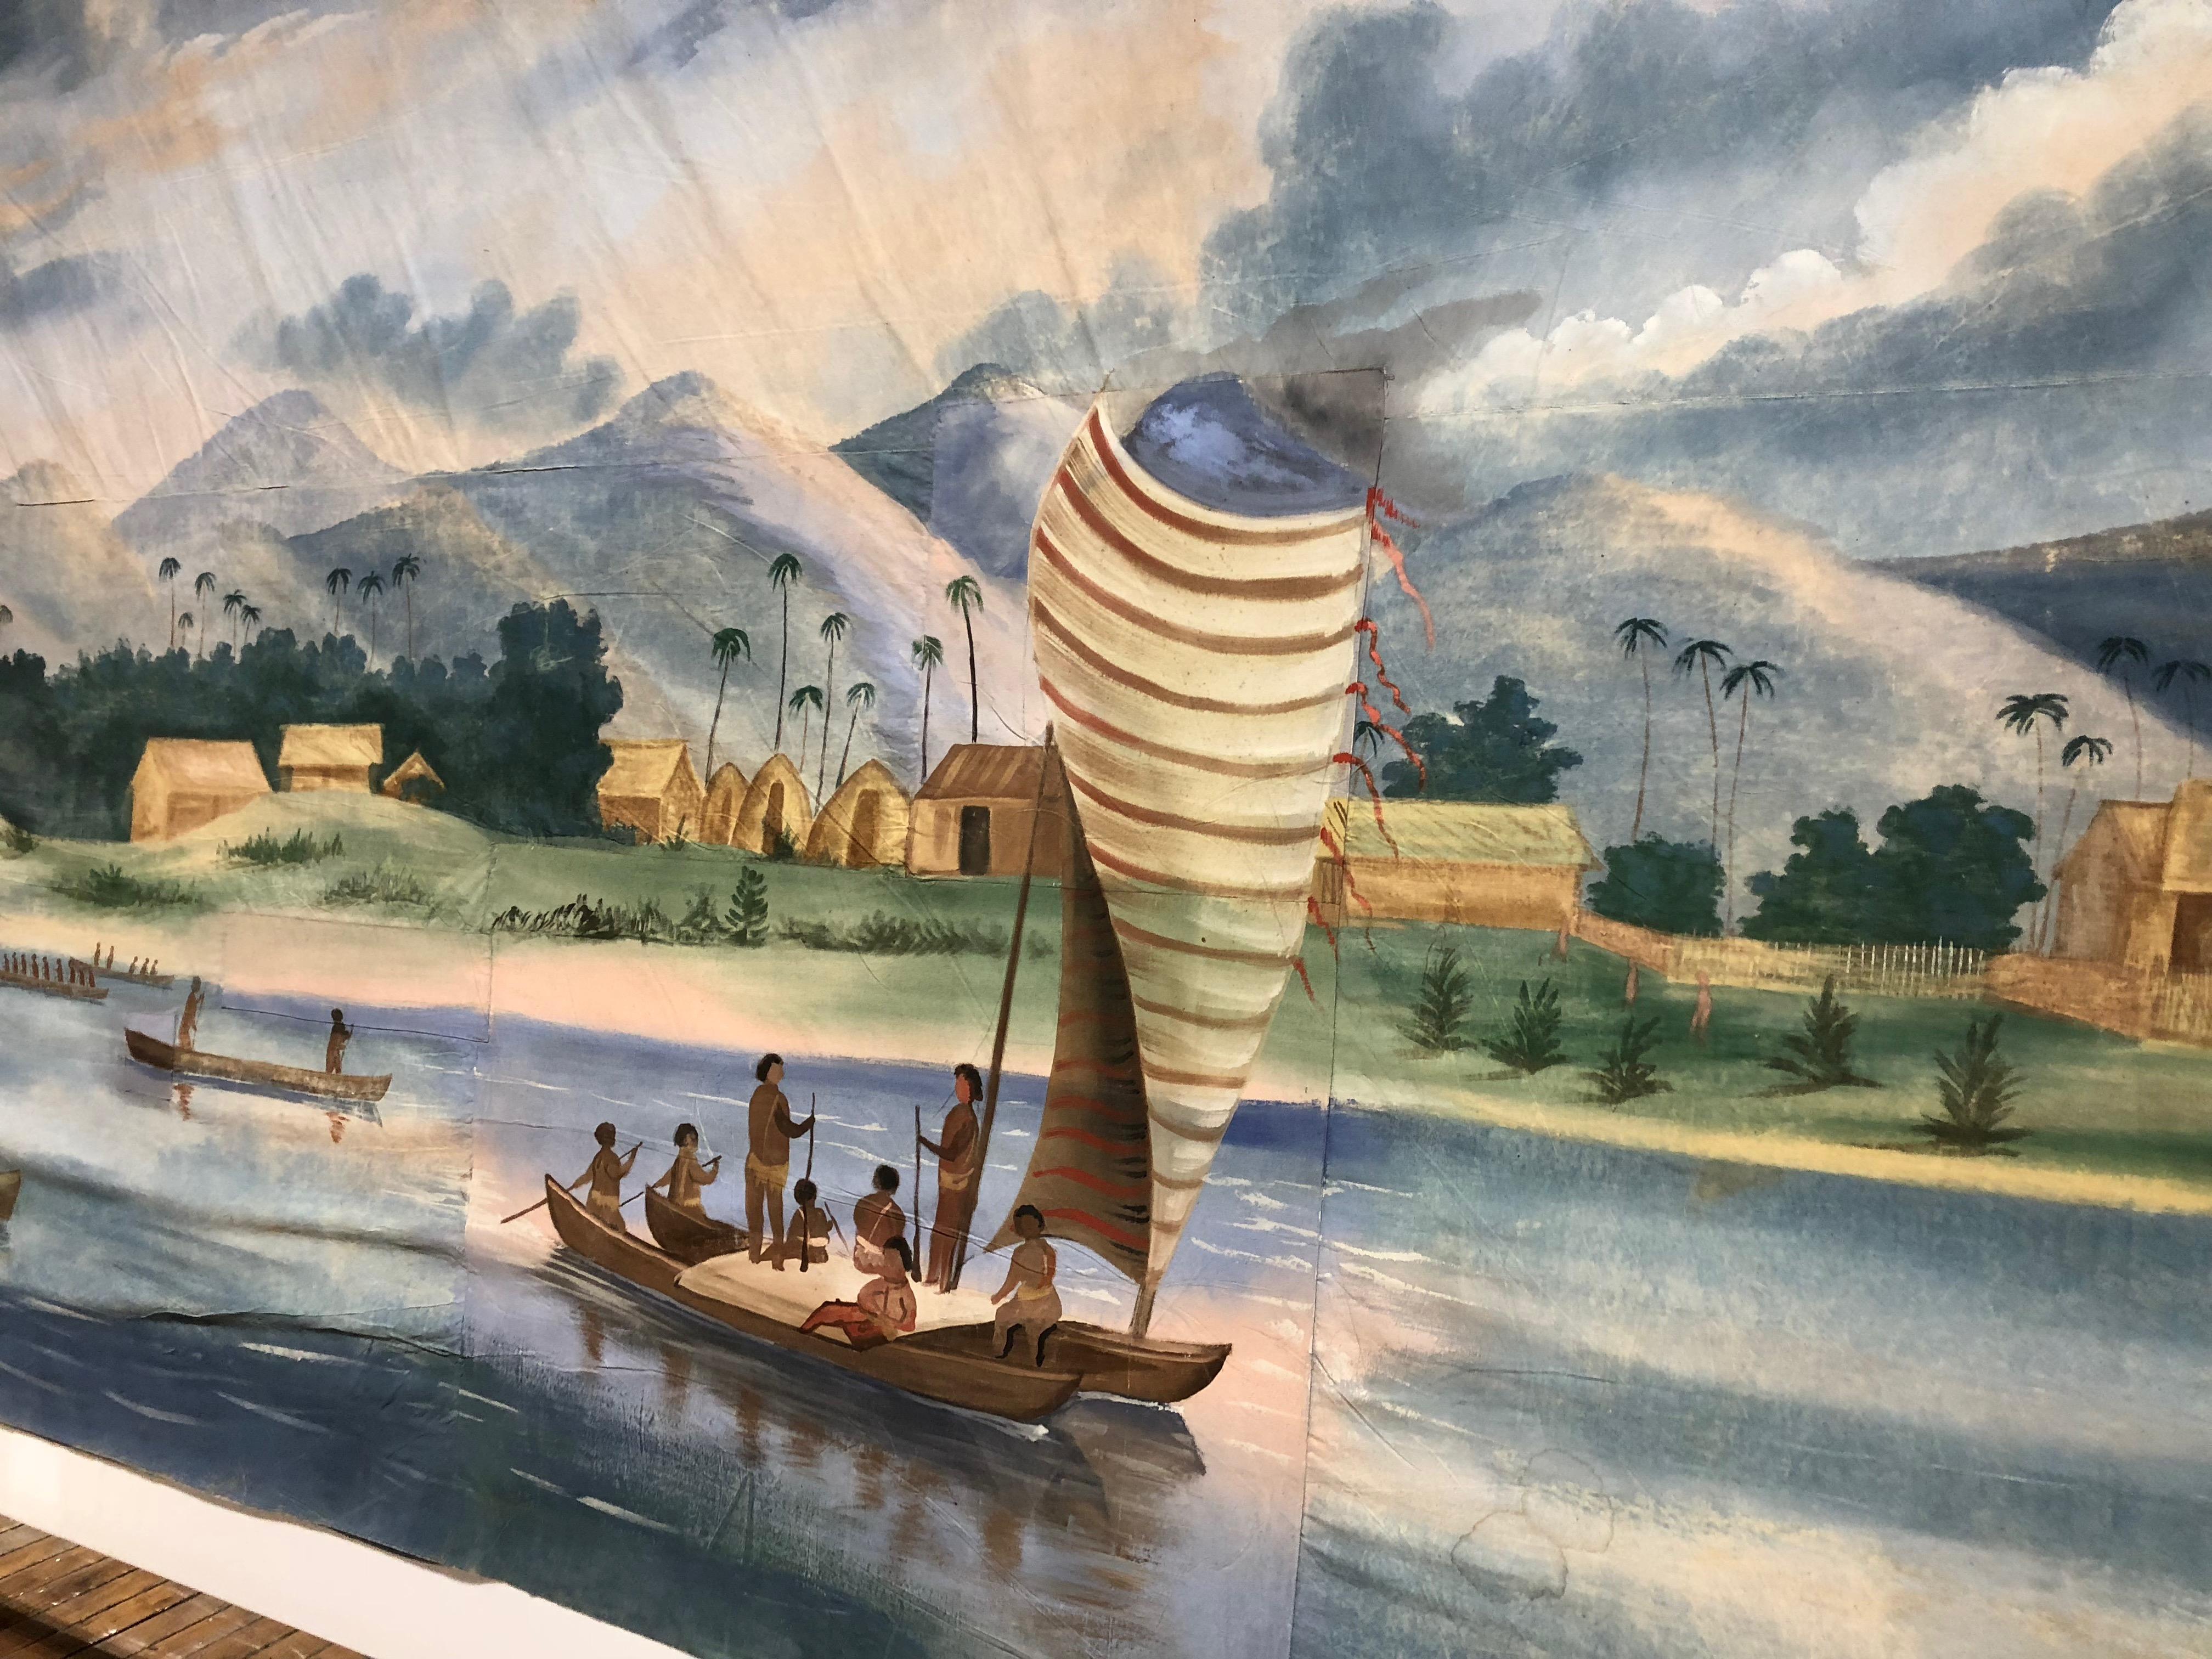 092518-Polynesian-sailboat